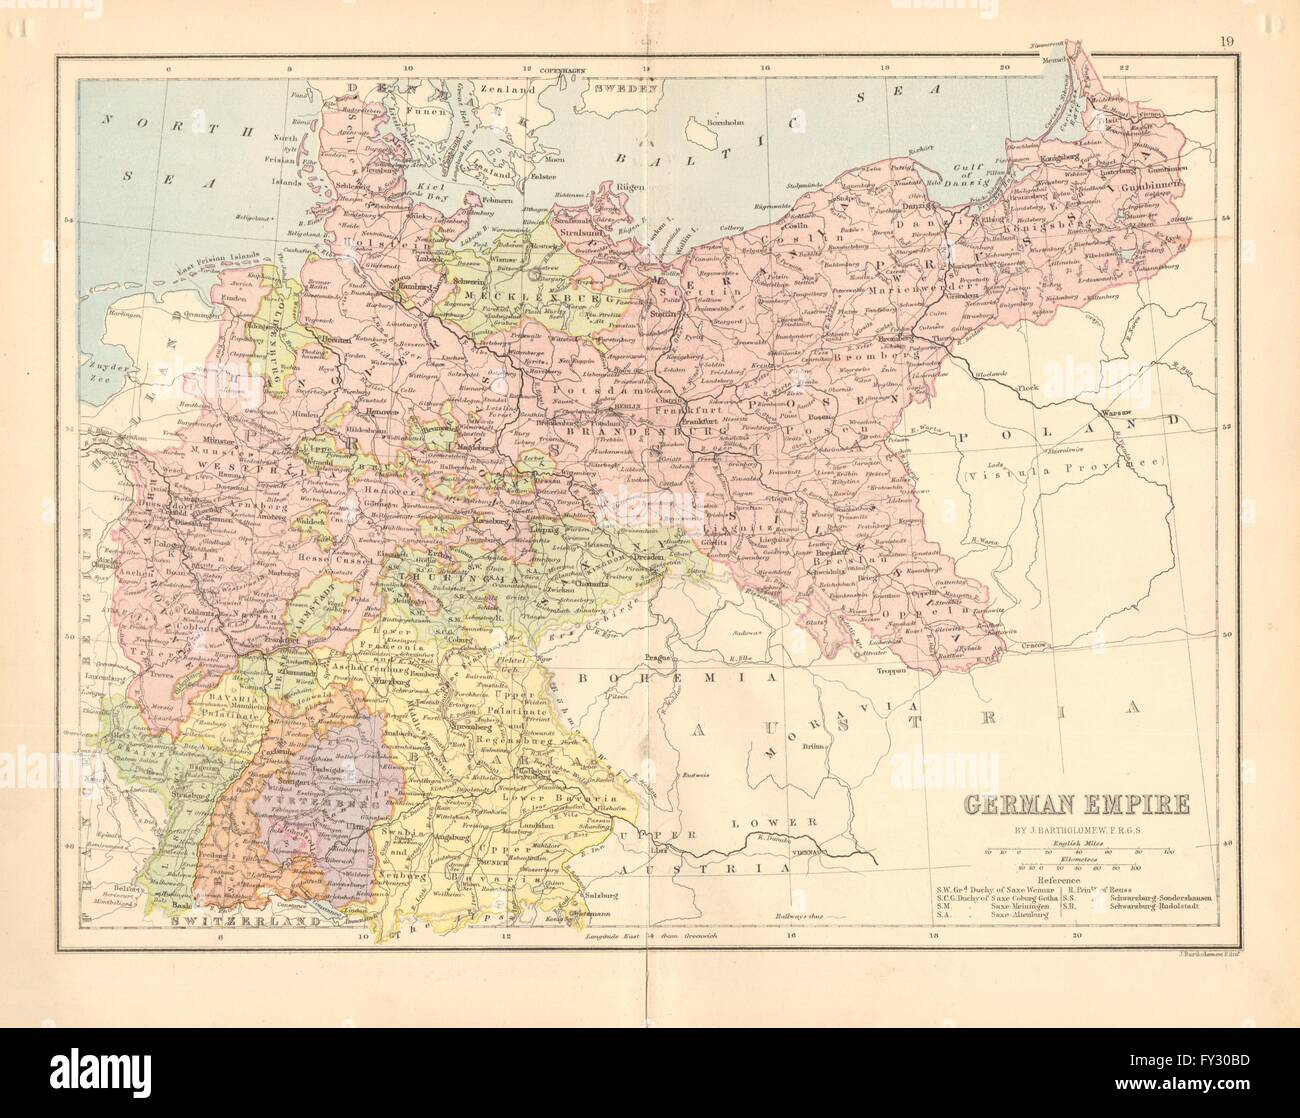 States Map Of Germany.Germany German Empire Prussia States Railways Bartholomew